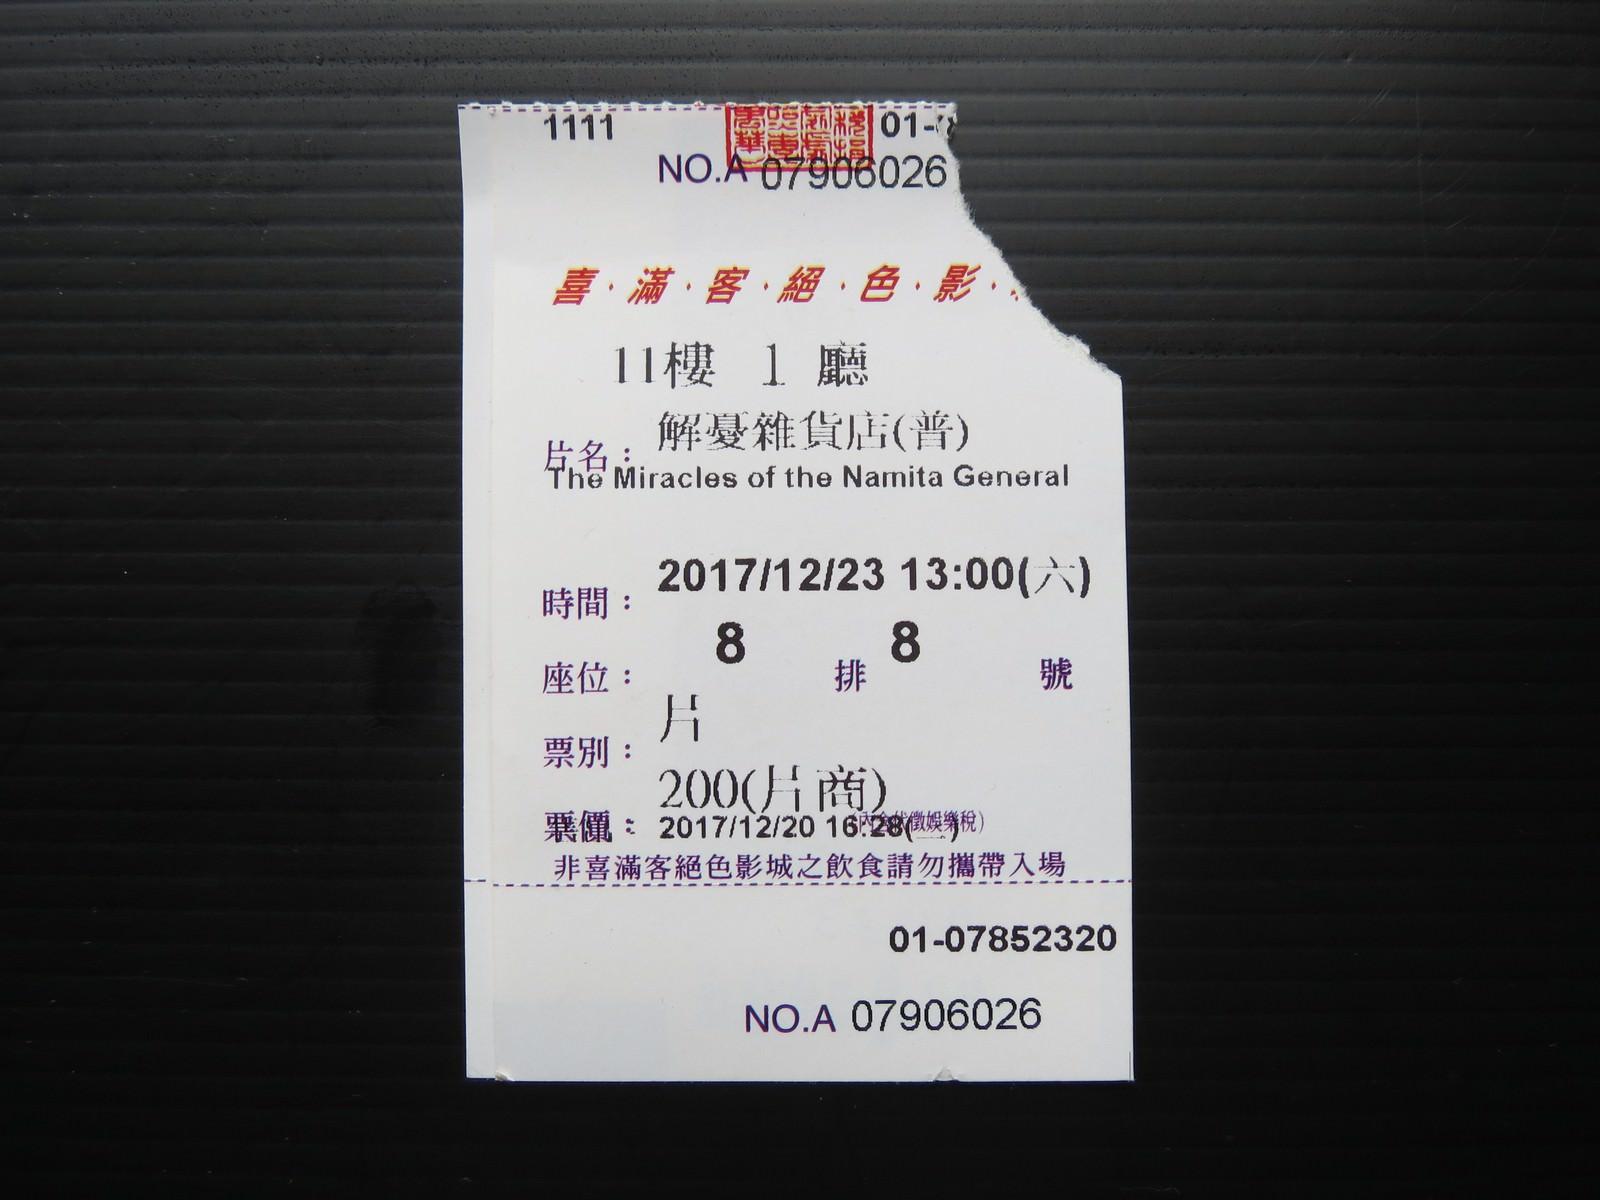 Movie, ナミヤ雑貨店の奇蹟(日本, 2017) / 解憂雜貨店(台灣.香港) / Miracles of the Namiya General Store(英文), 廣告看板, 電影票(特映會)